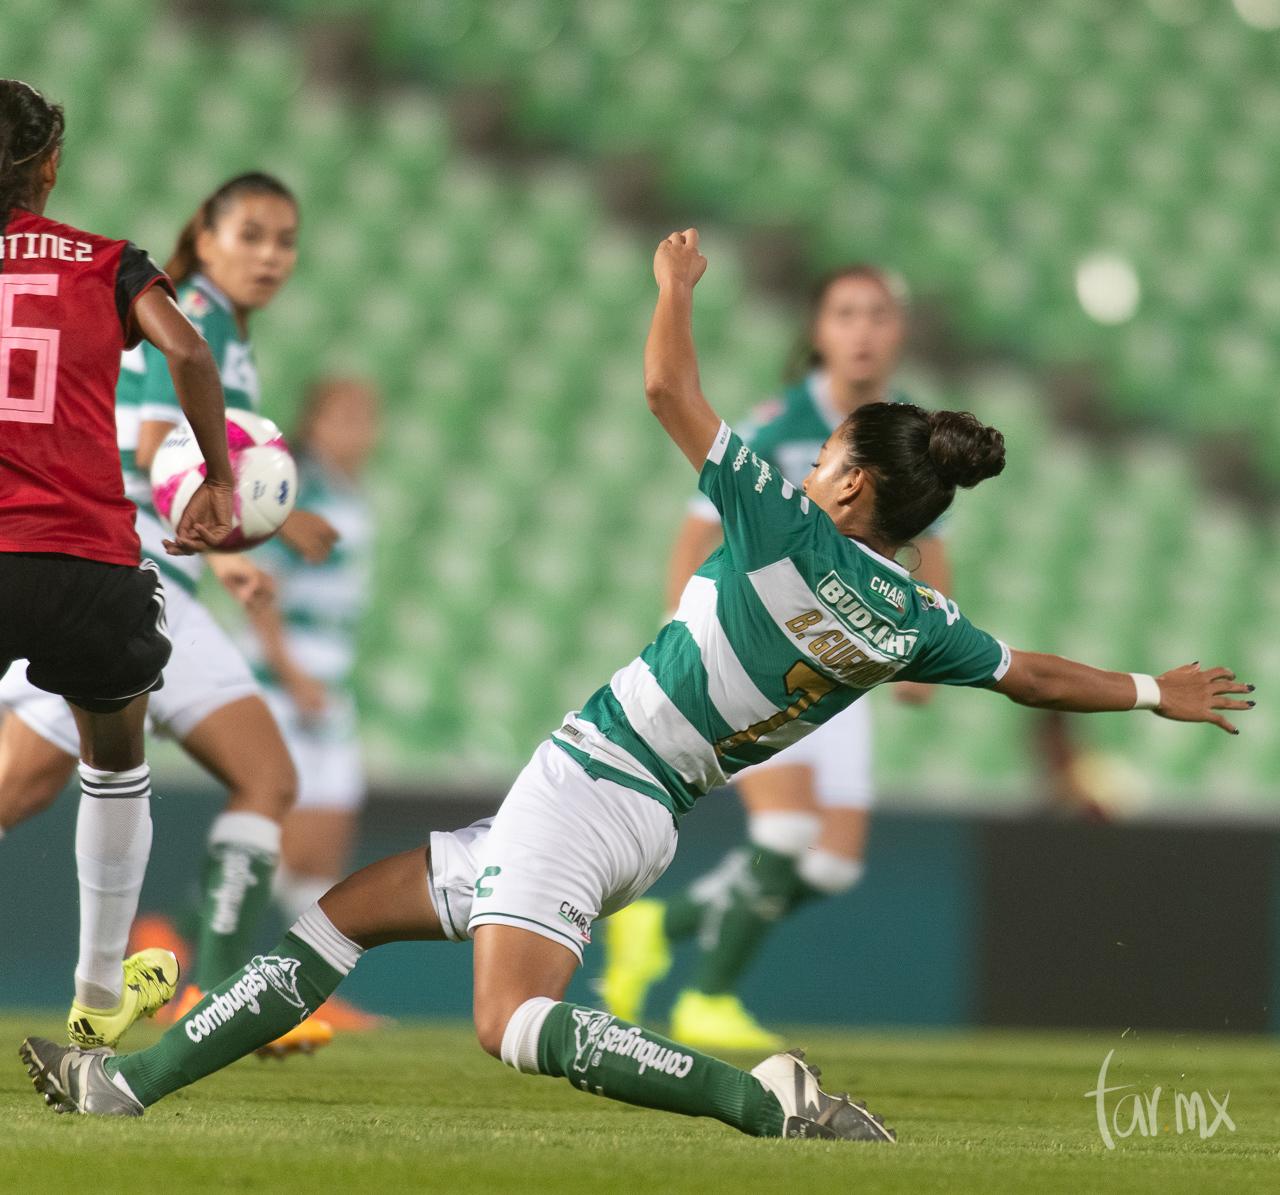 Andrea Hurtado 9